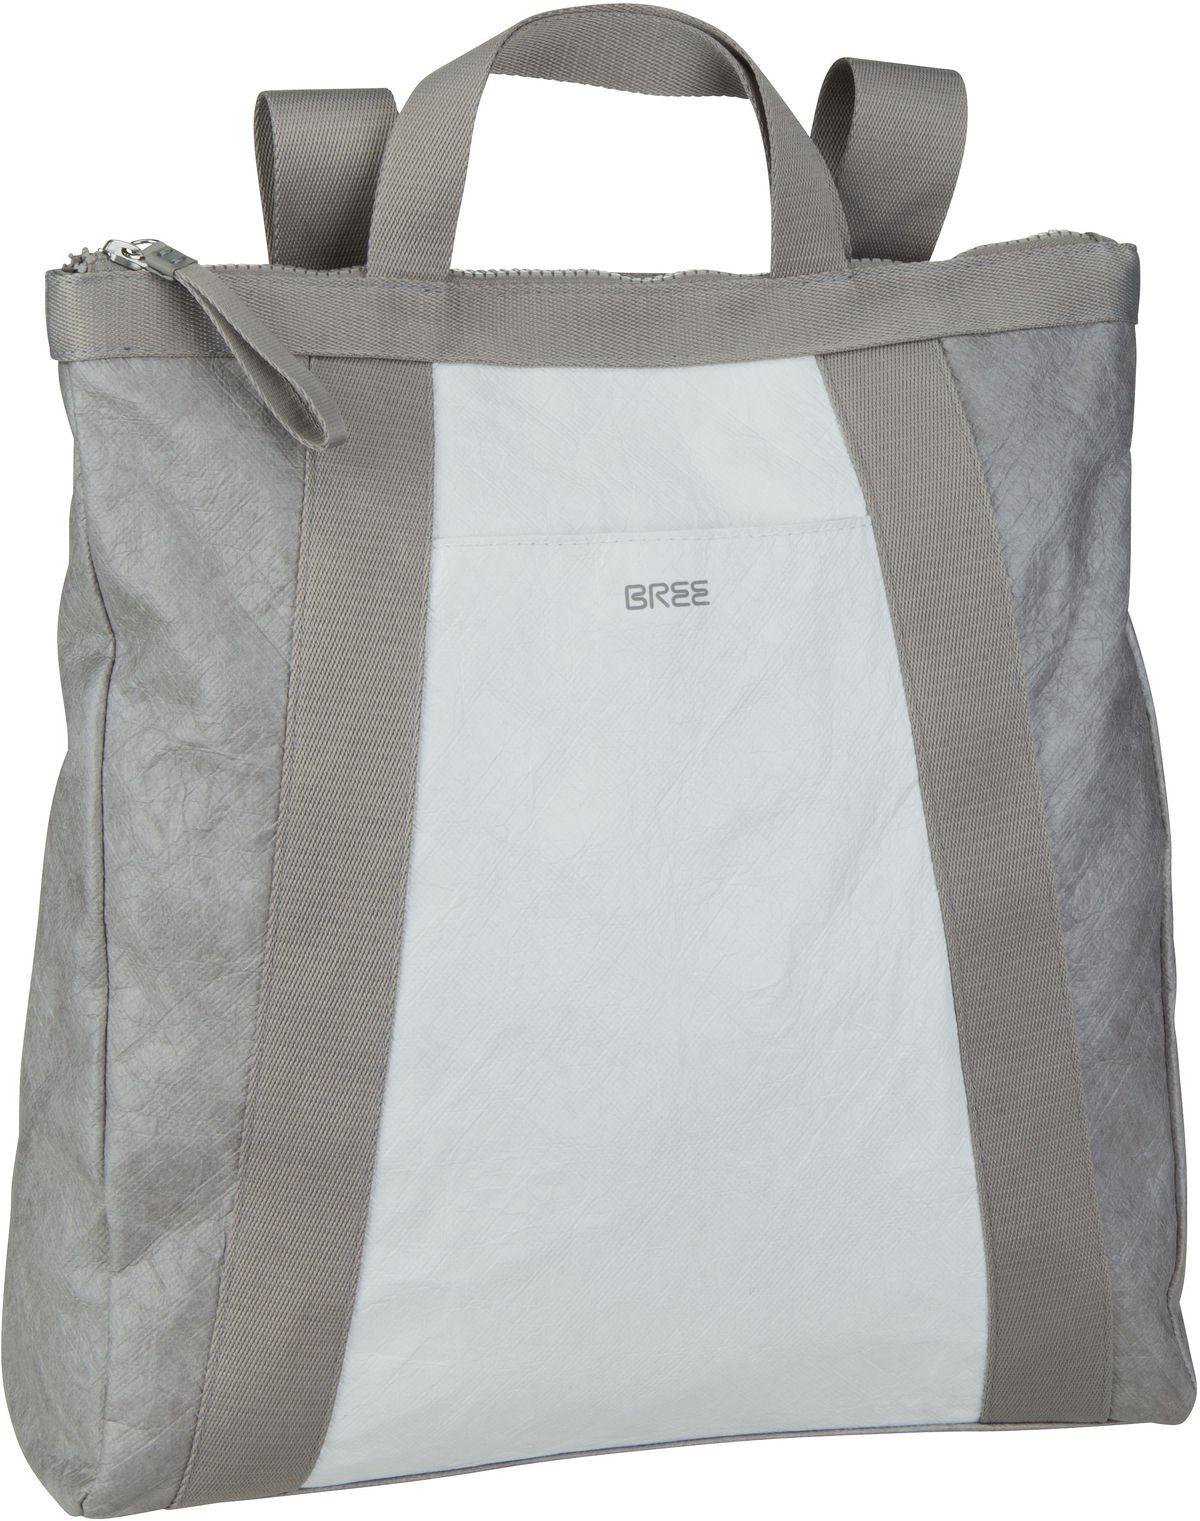 Rucksack / Daypack Vary 5 Grey/White (10 Liter)